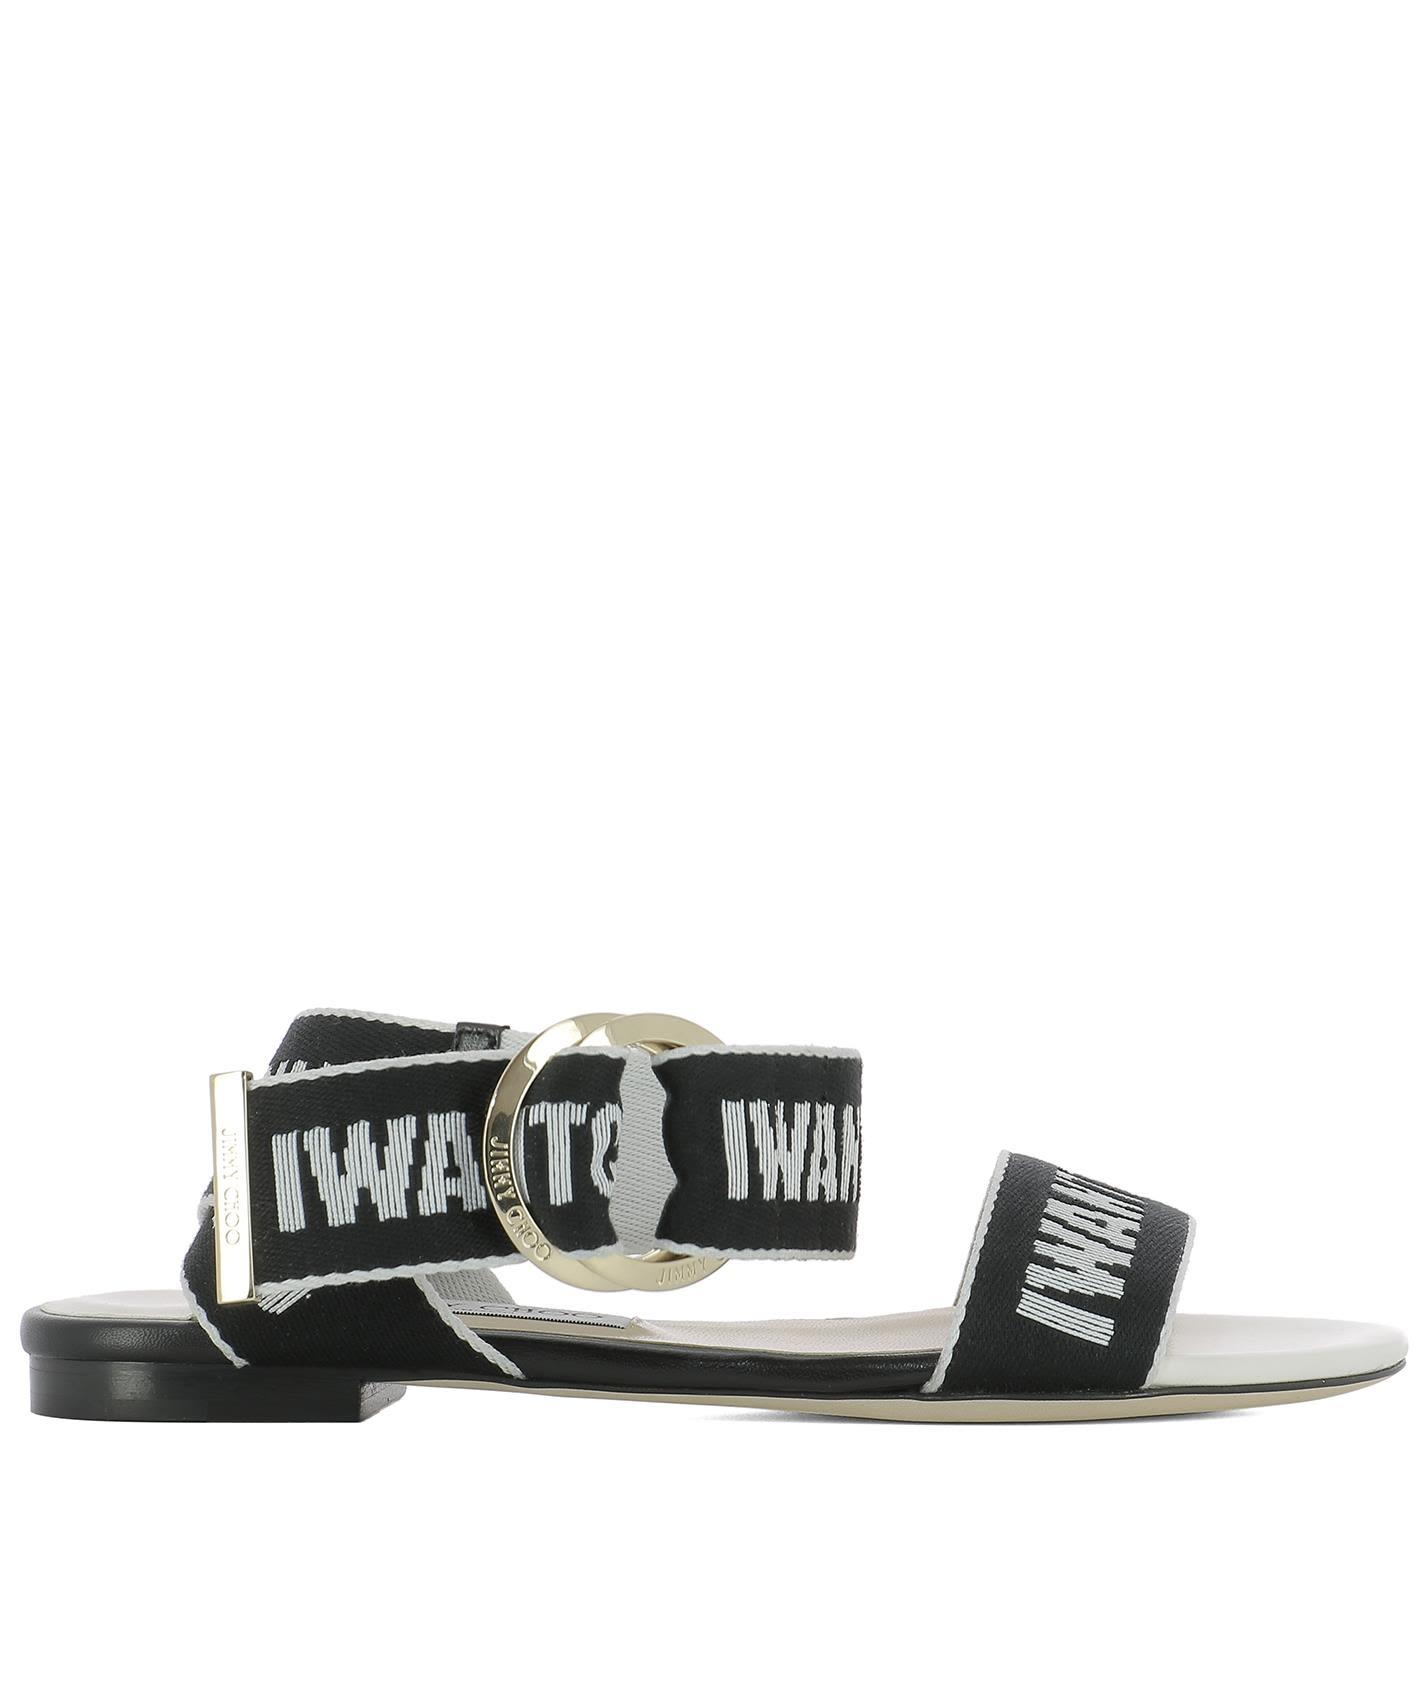 a6fe2b063998 Jimmy Choo Breanne Flat Sandals In Black